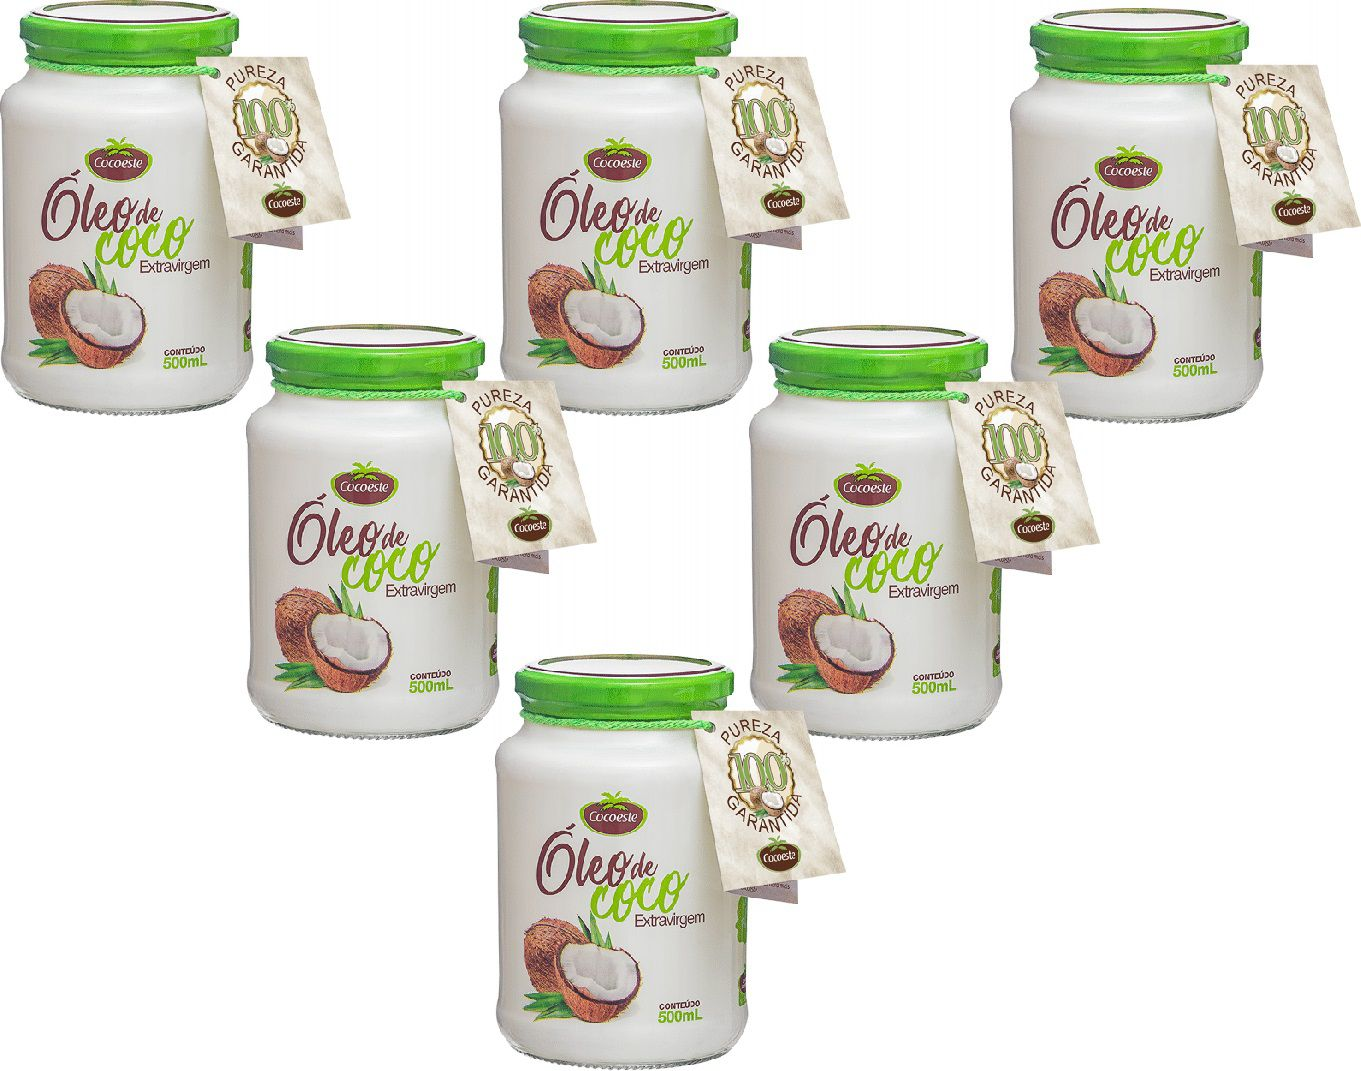 Kit 6 unidades óleo de coco extravirgem 500 mL - Cocoeste